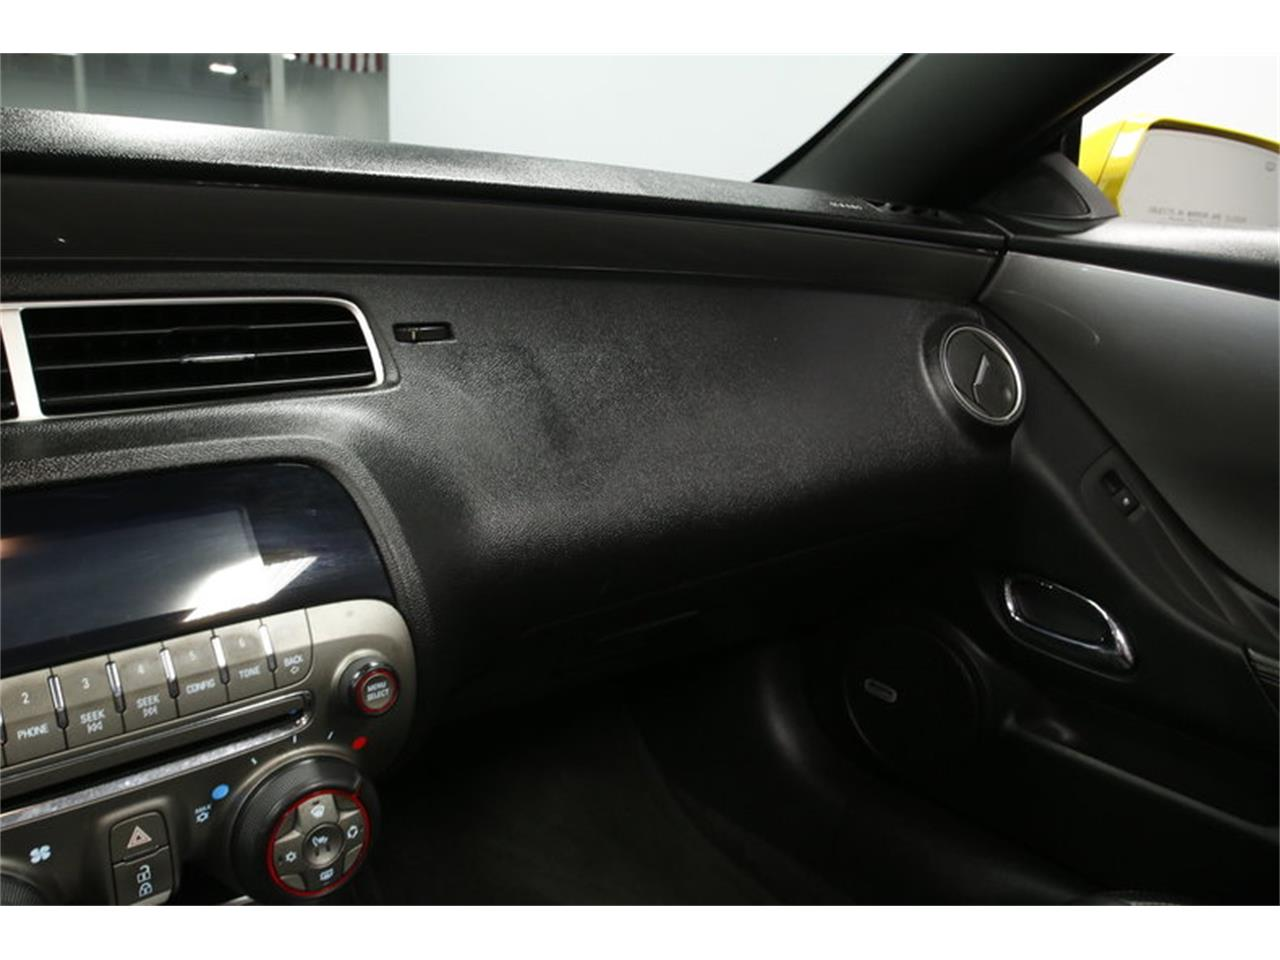 Large Picture of 2011 Camaro located in Concord North Carolina - $34,995.00 - MZEP